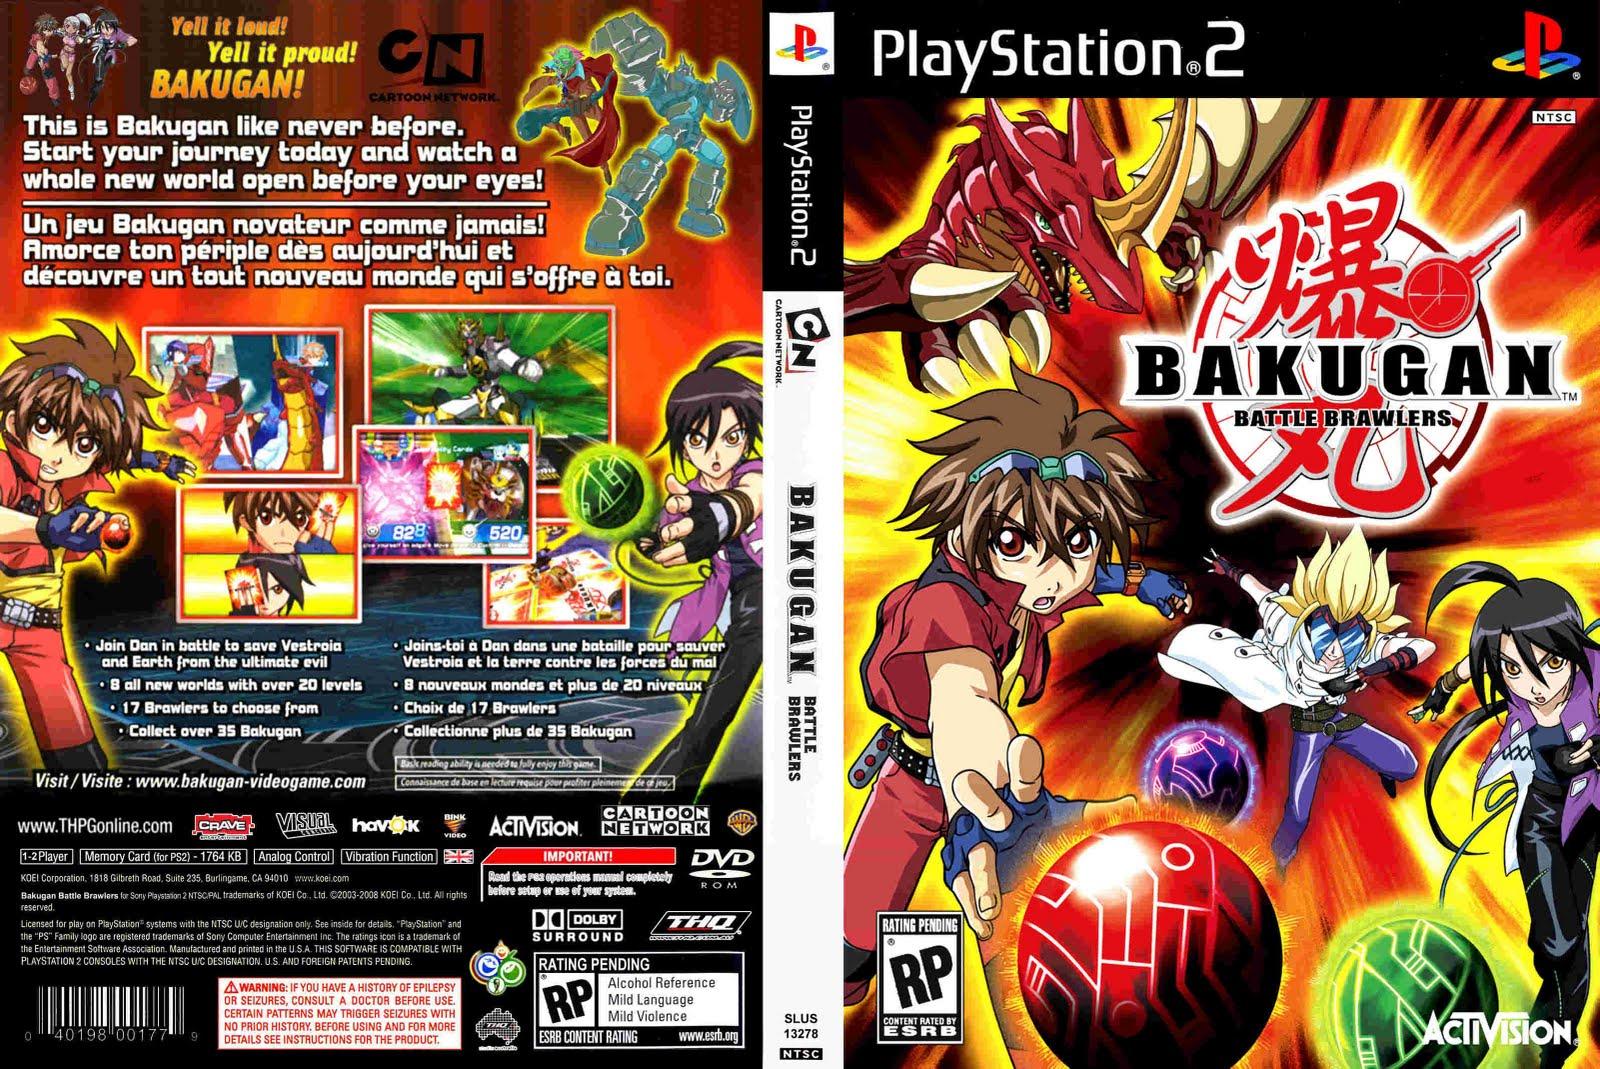 Bakugan Battle Brawlers NDS ROM (USA) Download - GameGinie